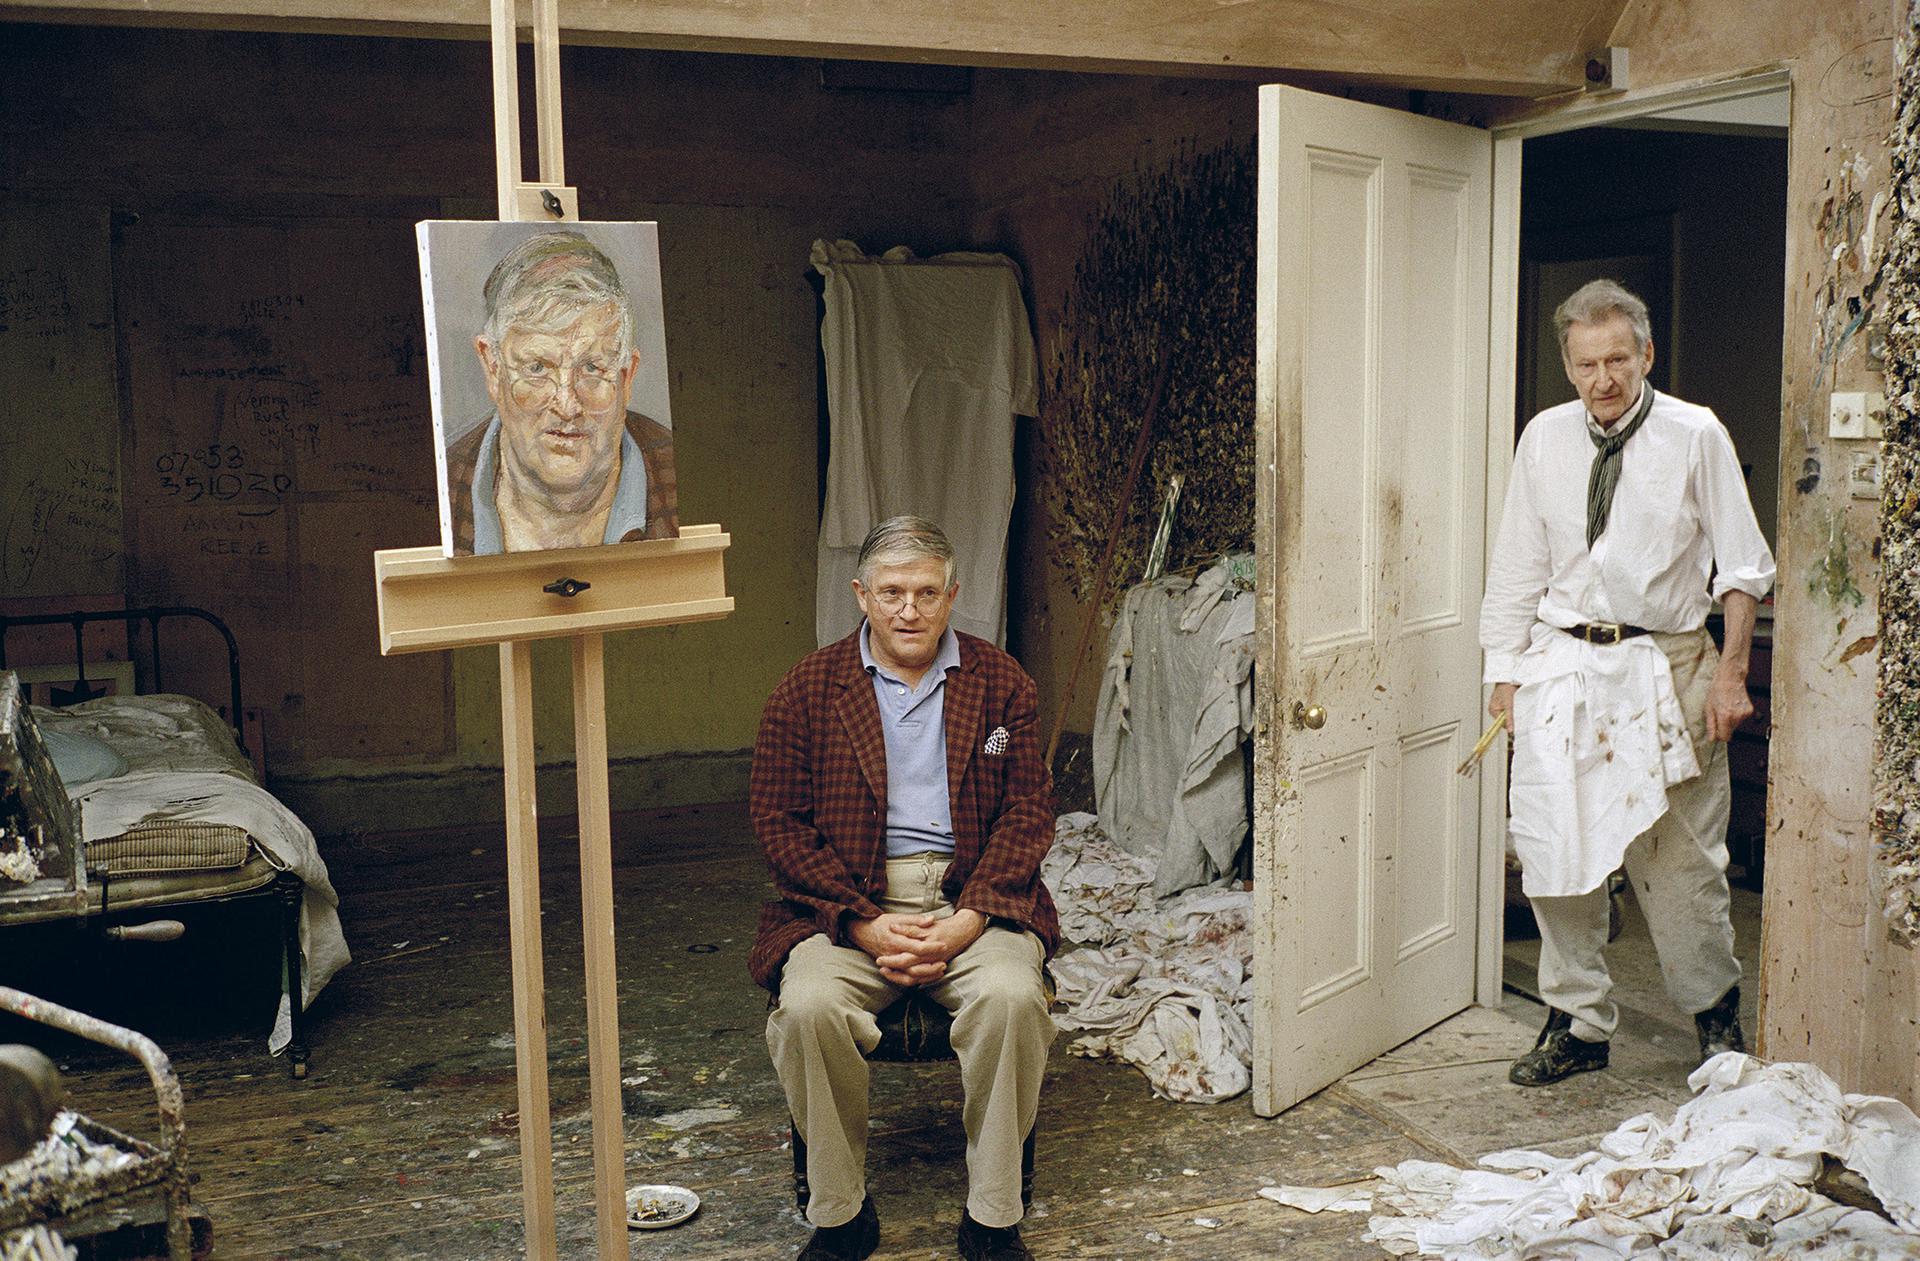 Freud dipinge, Hockney convince. Lo storico ritratto venduto caro da Sotheby's